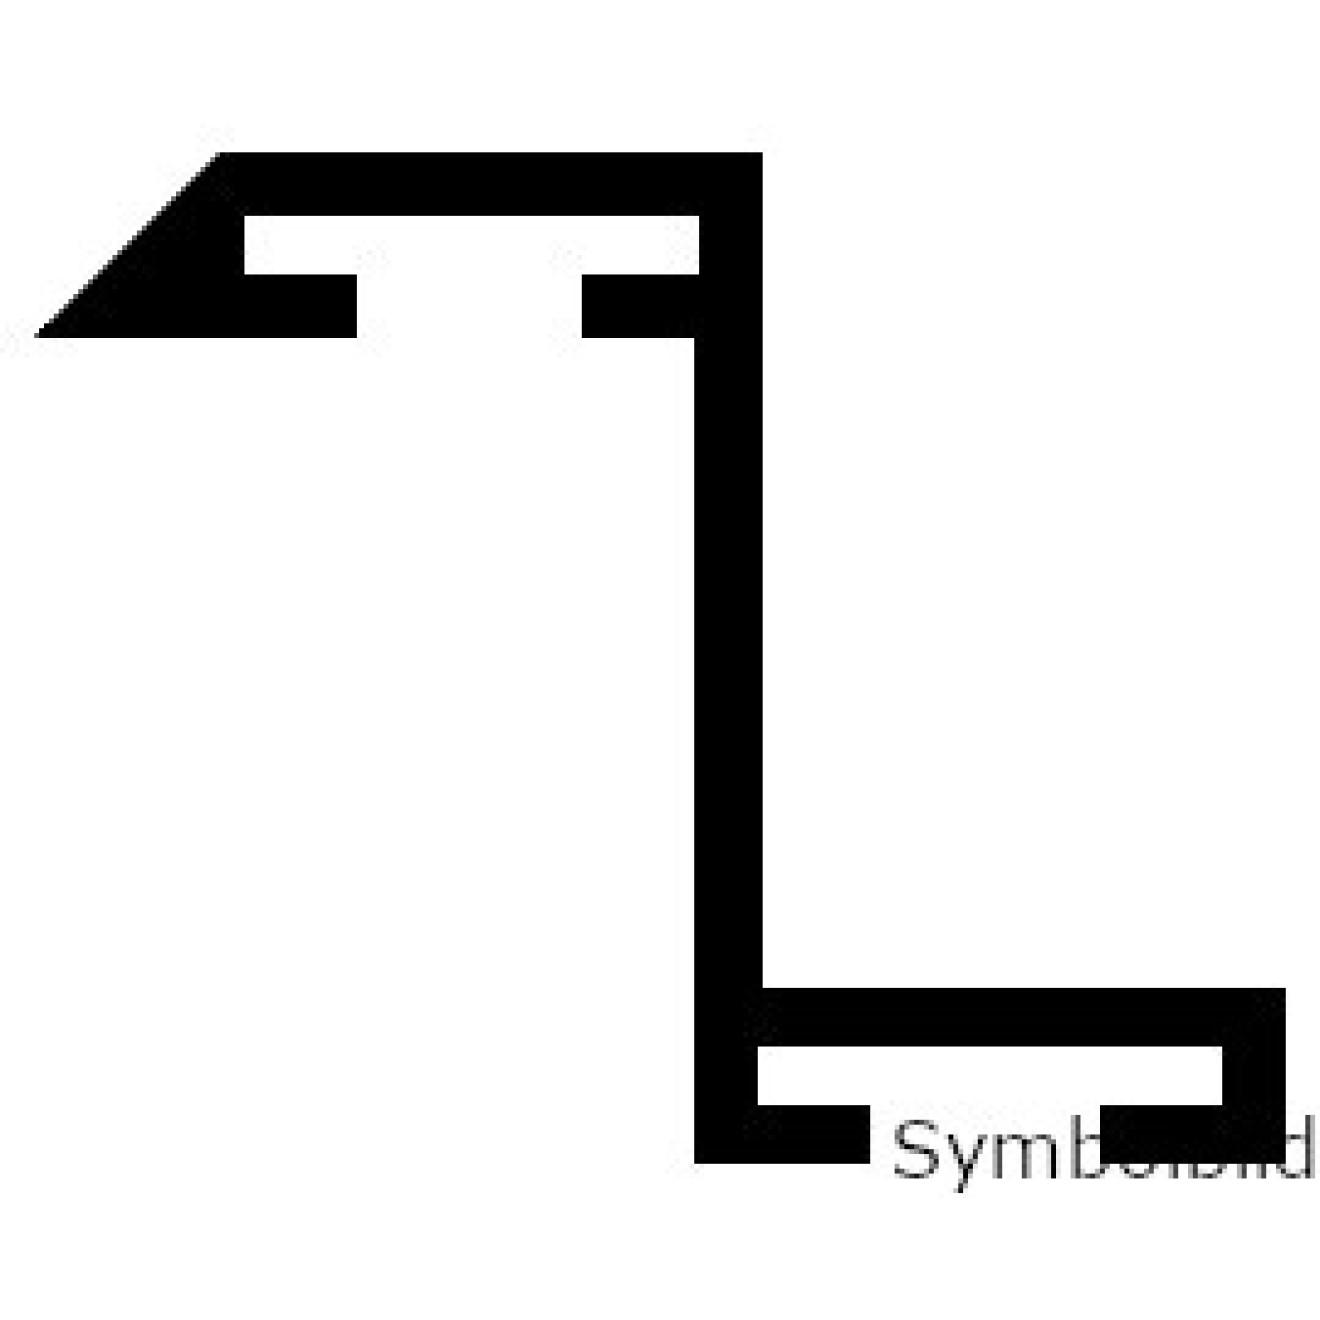 z rahmenprofil alu silber elox passend zu ve 4 meter bessler24 beschlaege. Black Bedroom Furniture Sets. Home Design Ideas